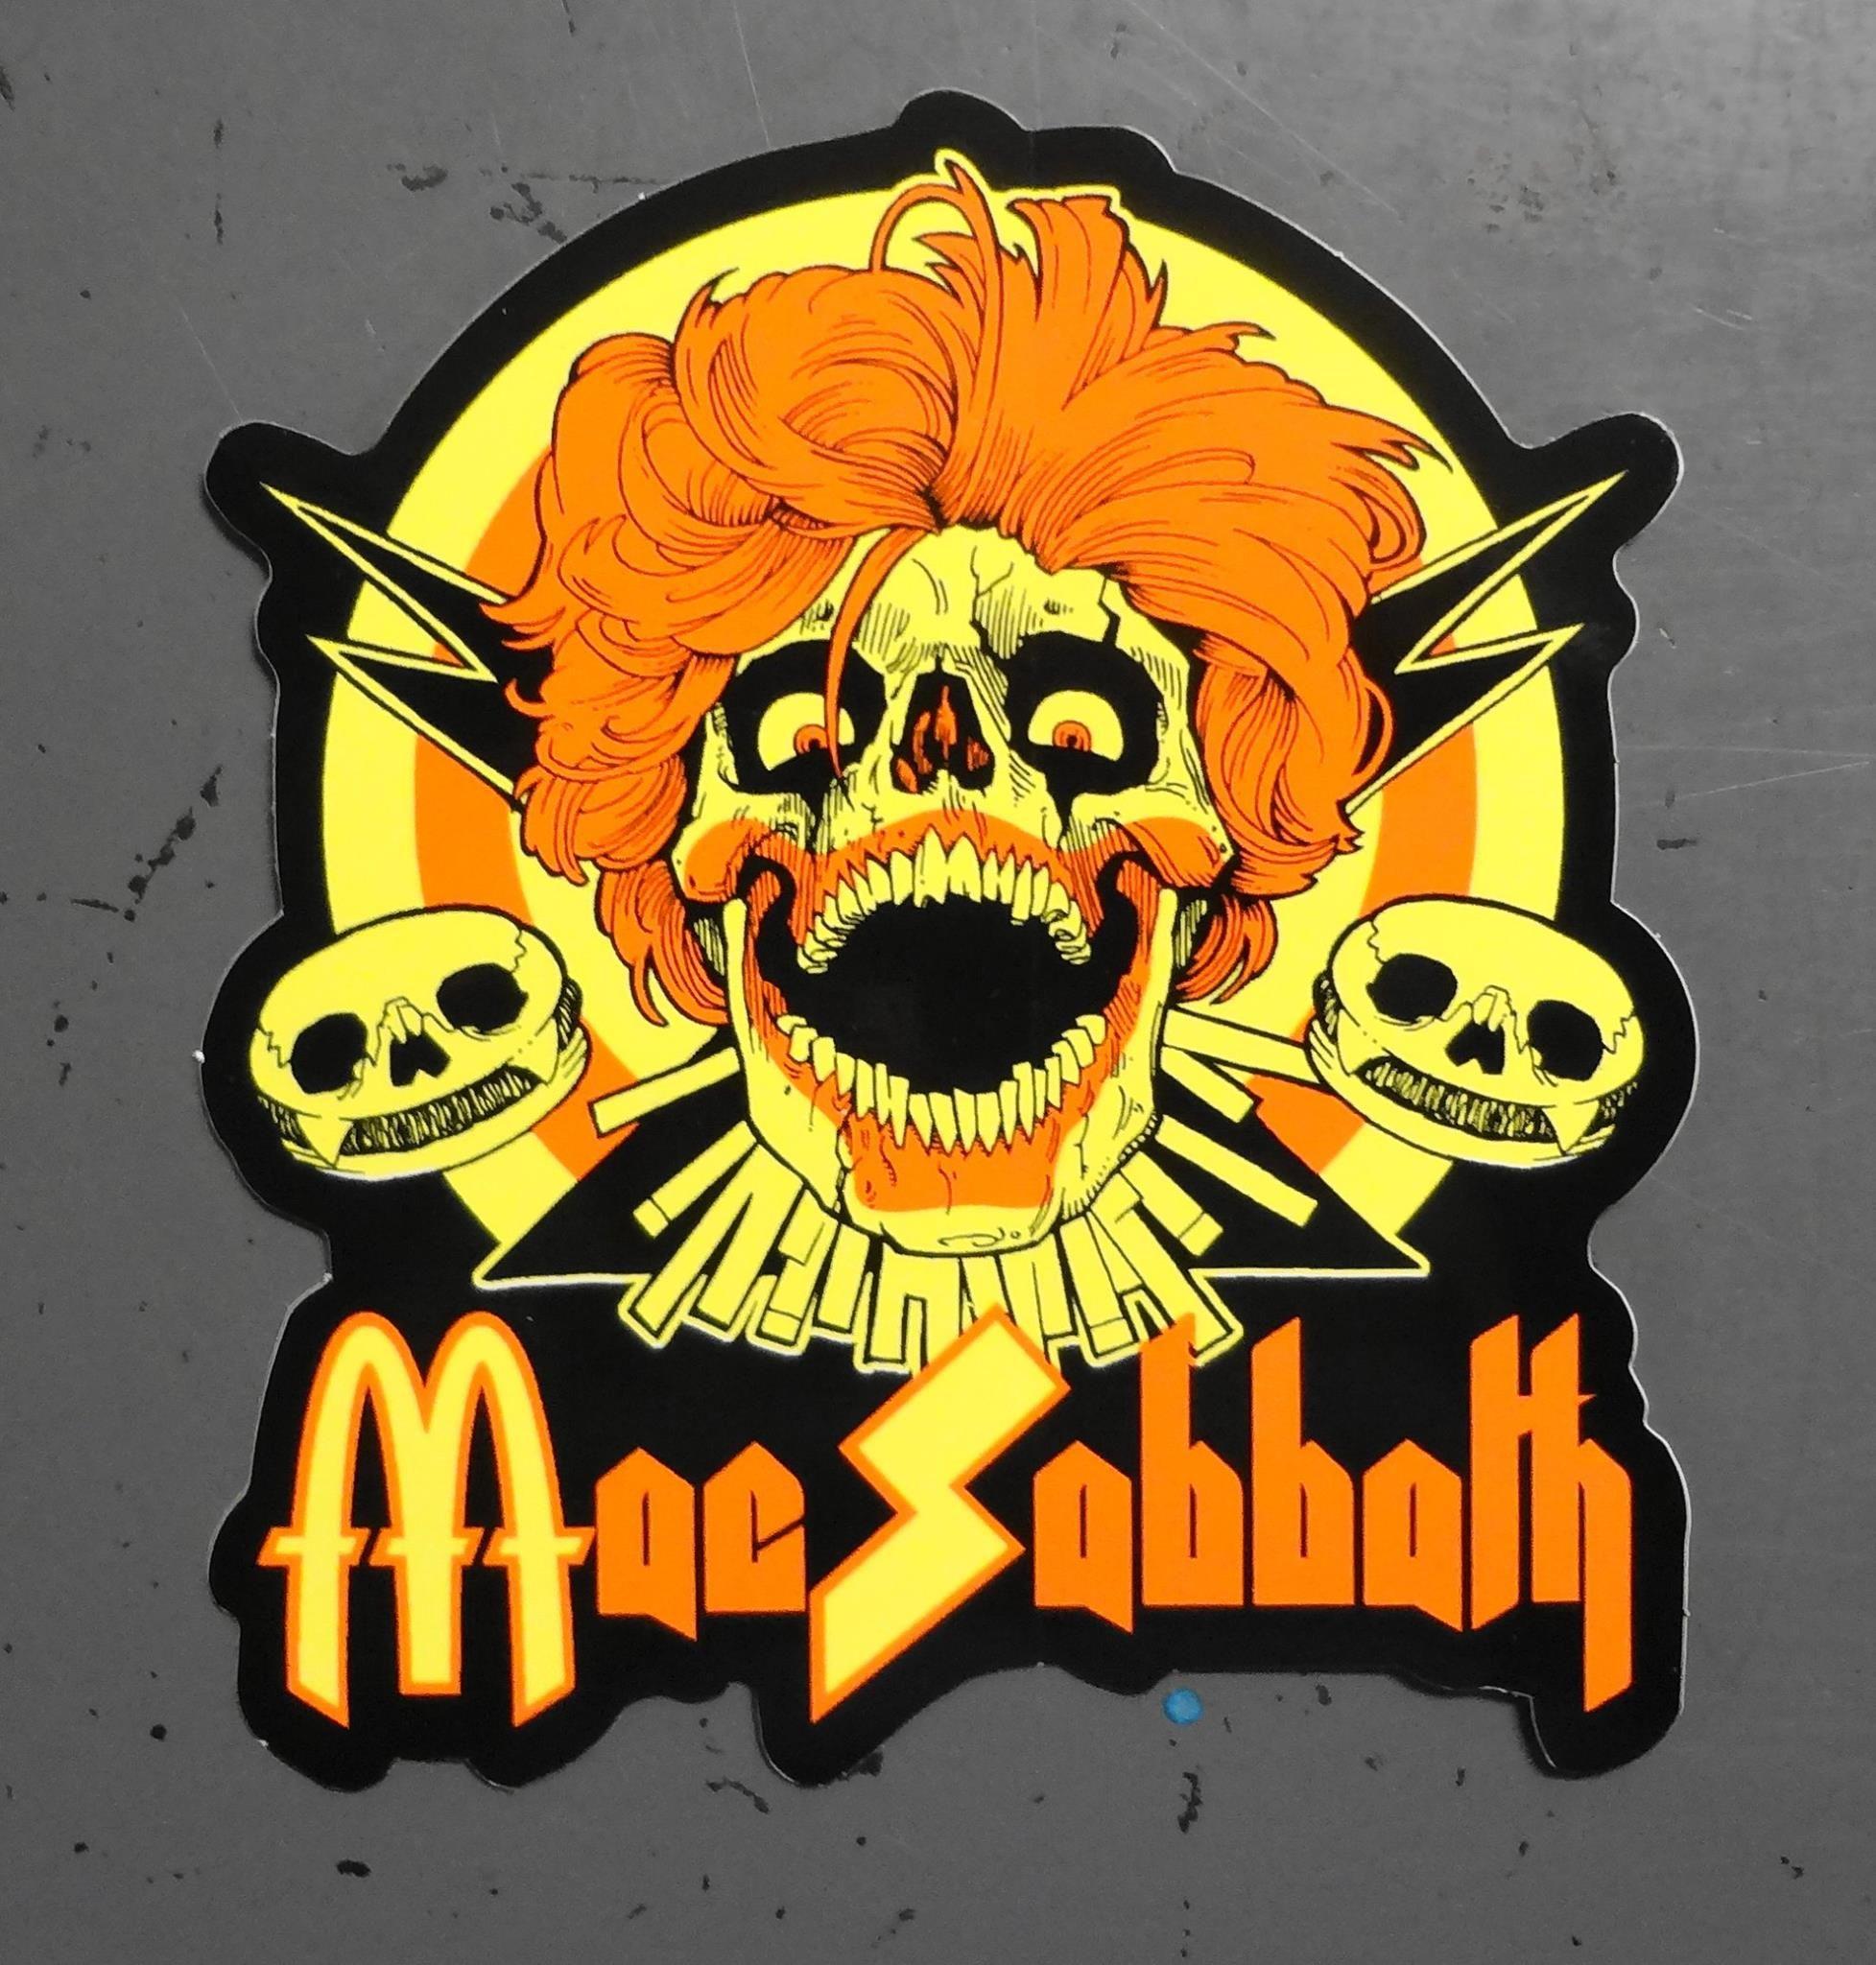 Mac Sabbath Stickers Decals Swag Pinterest Sabbath Metal - Promotional custom vinyl stickers business